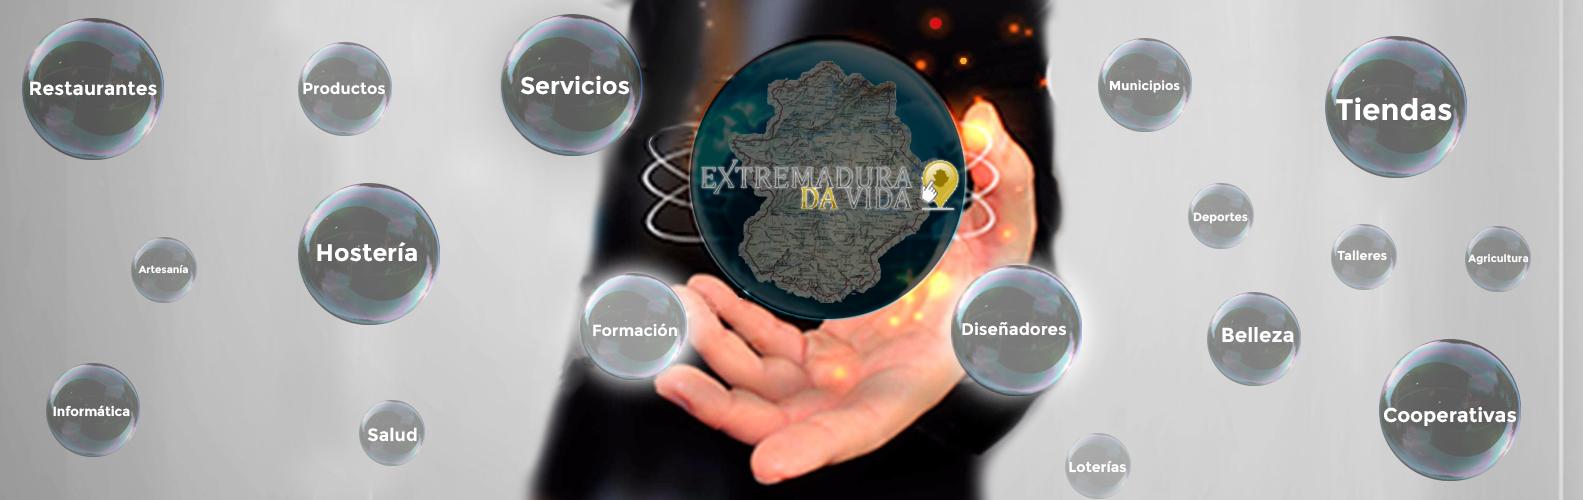 Extremadura Empresas españolas España da vida Plataforma